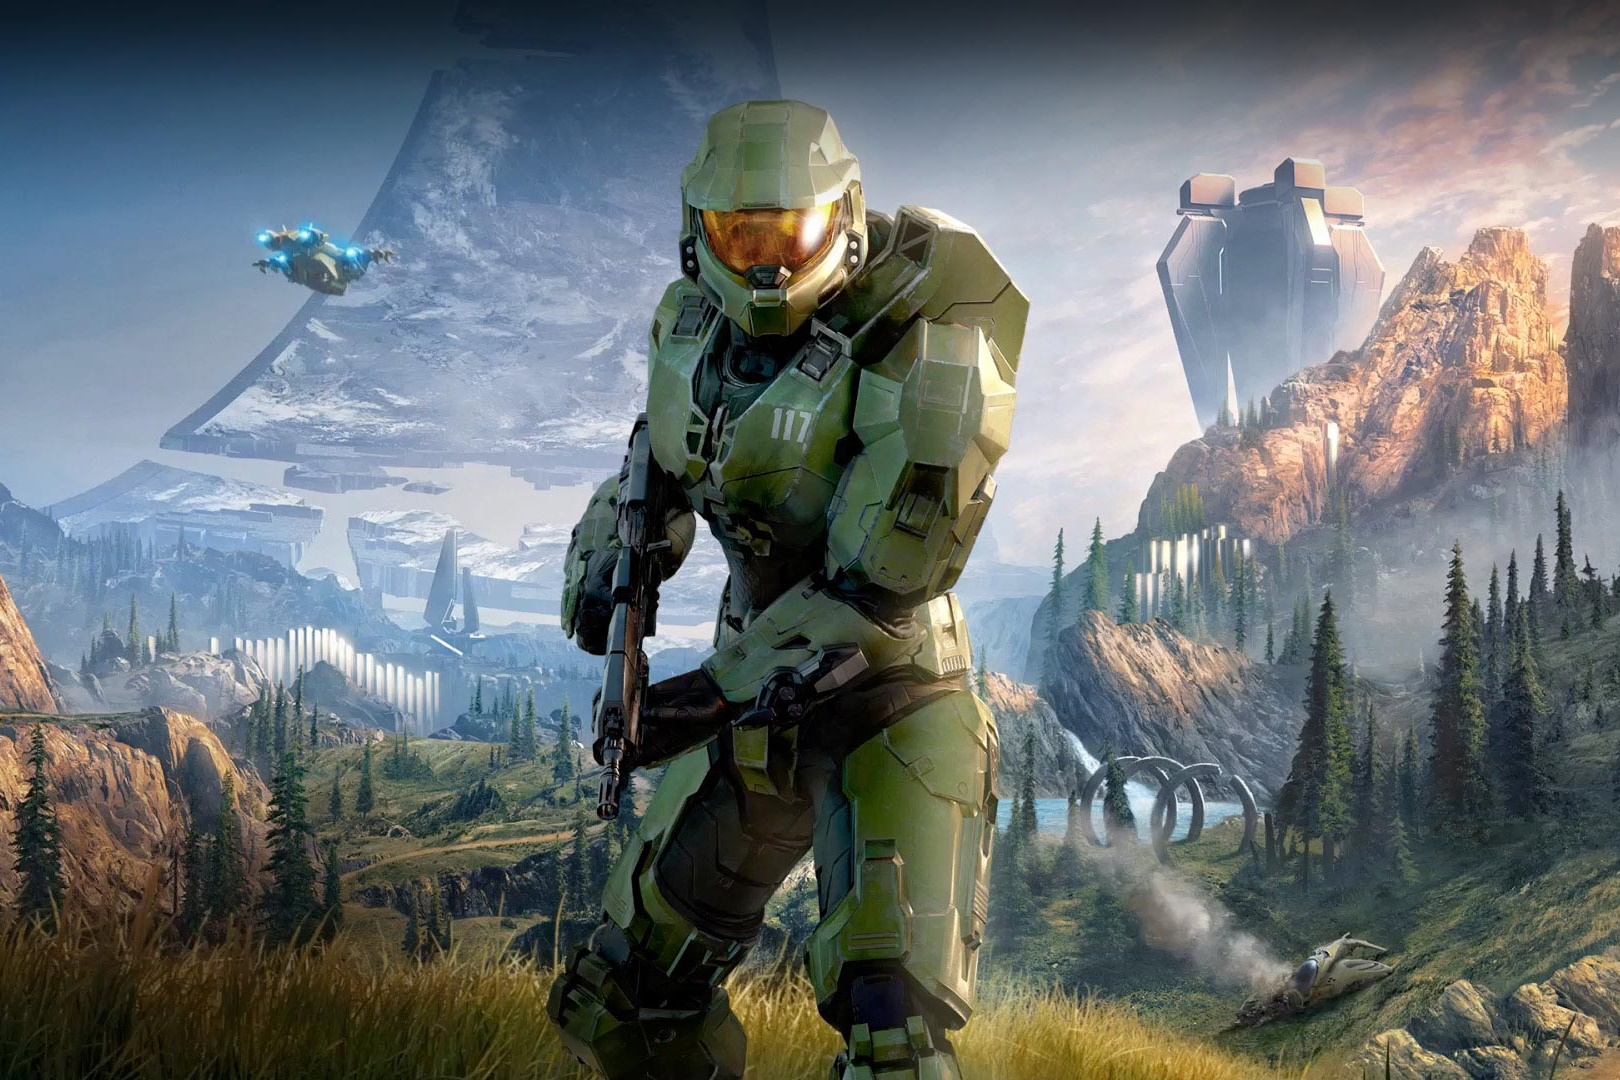 Halo Infinite será lançado em 9 de novembro, diz Xbox Brasil [Rumor]